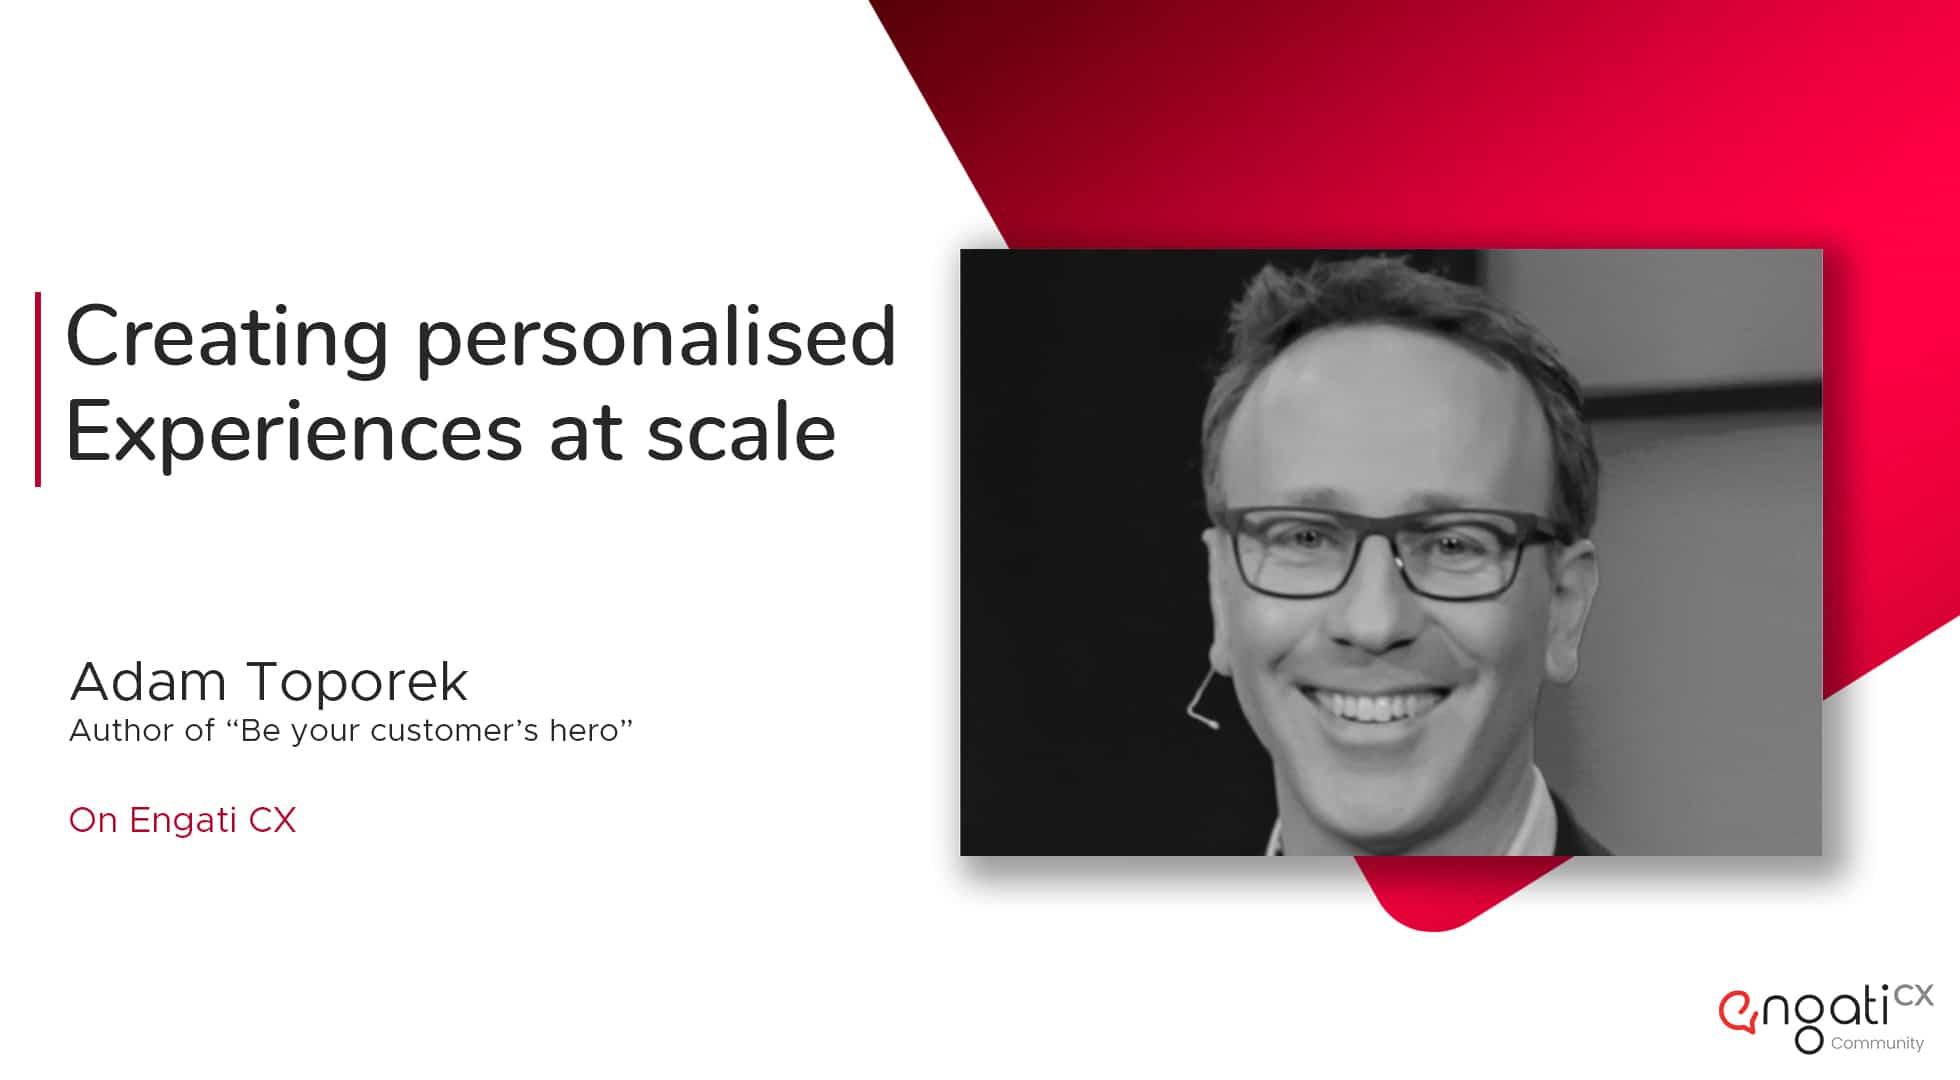 How to create personalized experiences at scale | Adam Toporek | Engati CX